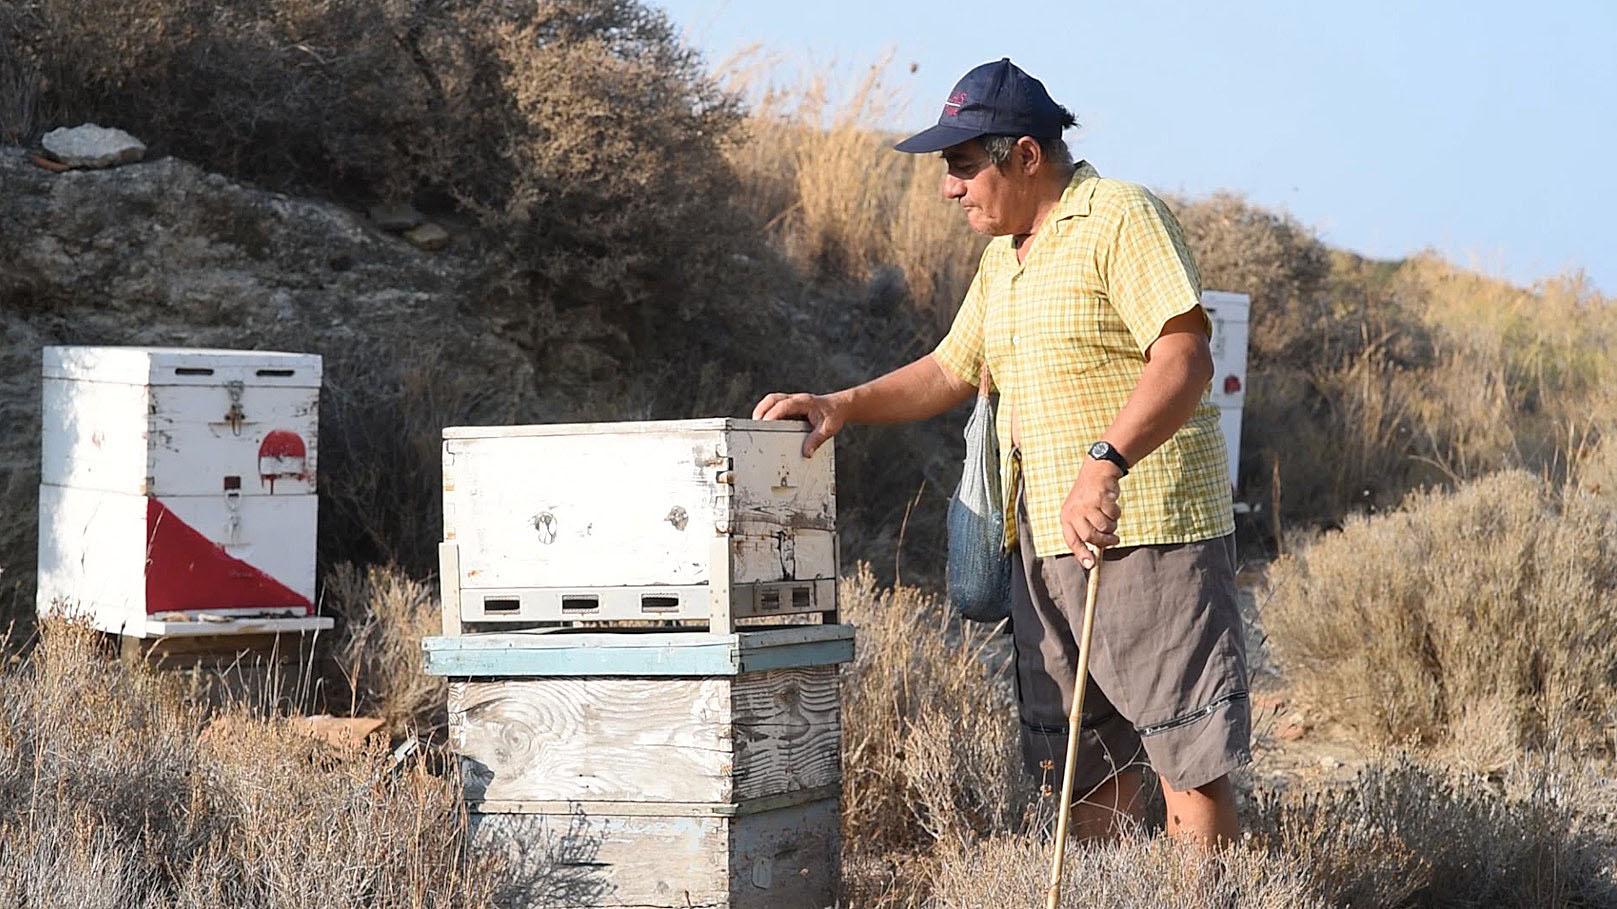 The Beekeepers - George with his beloved bees.